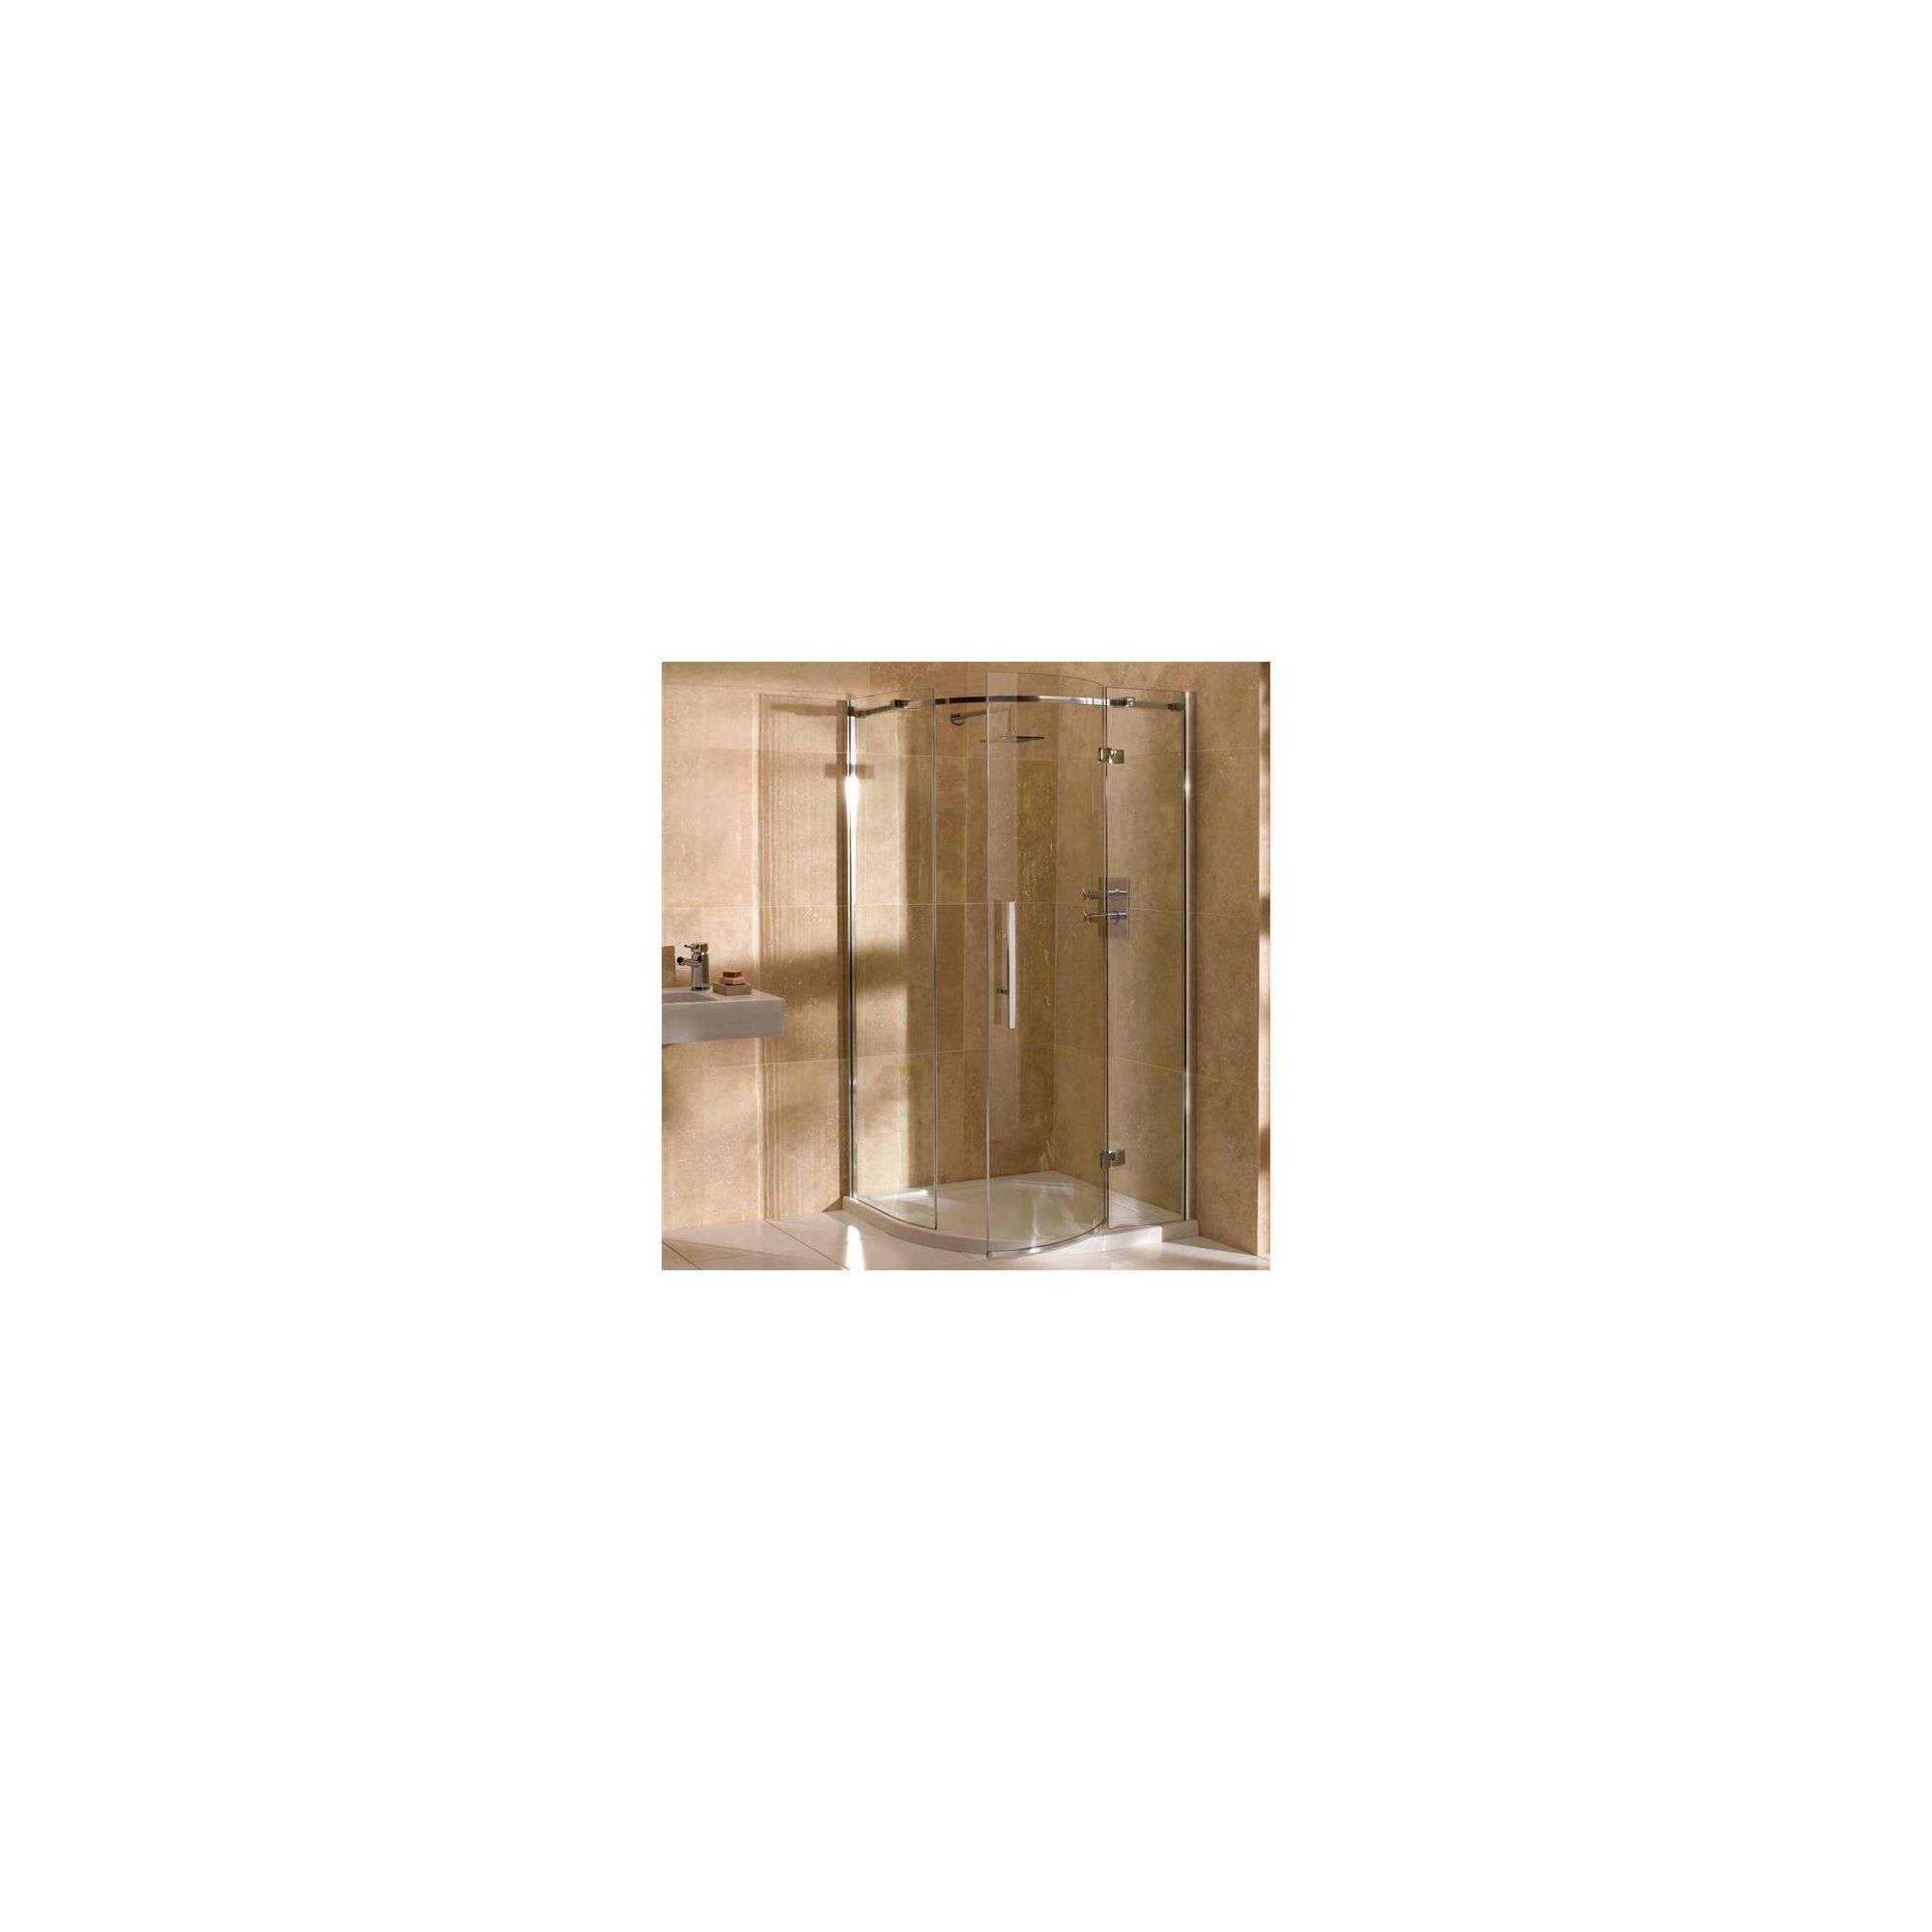 Merlyn Vivid Nine Quadrant Shower Door, 900mm x 900mm, Left Handed, 8mm Glass at Tesco Direct